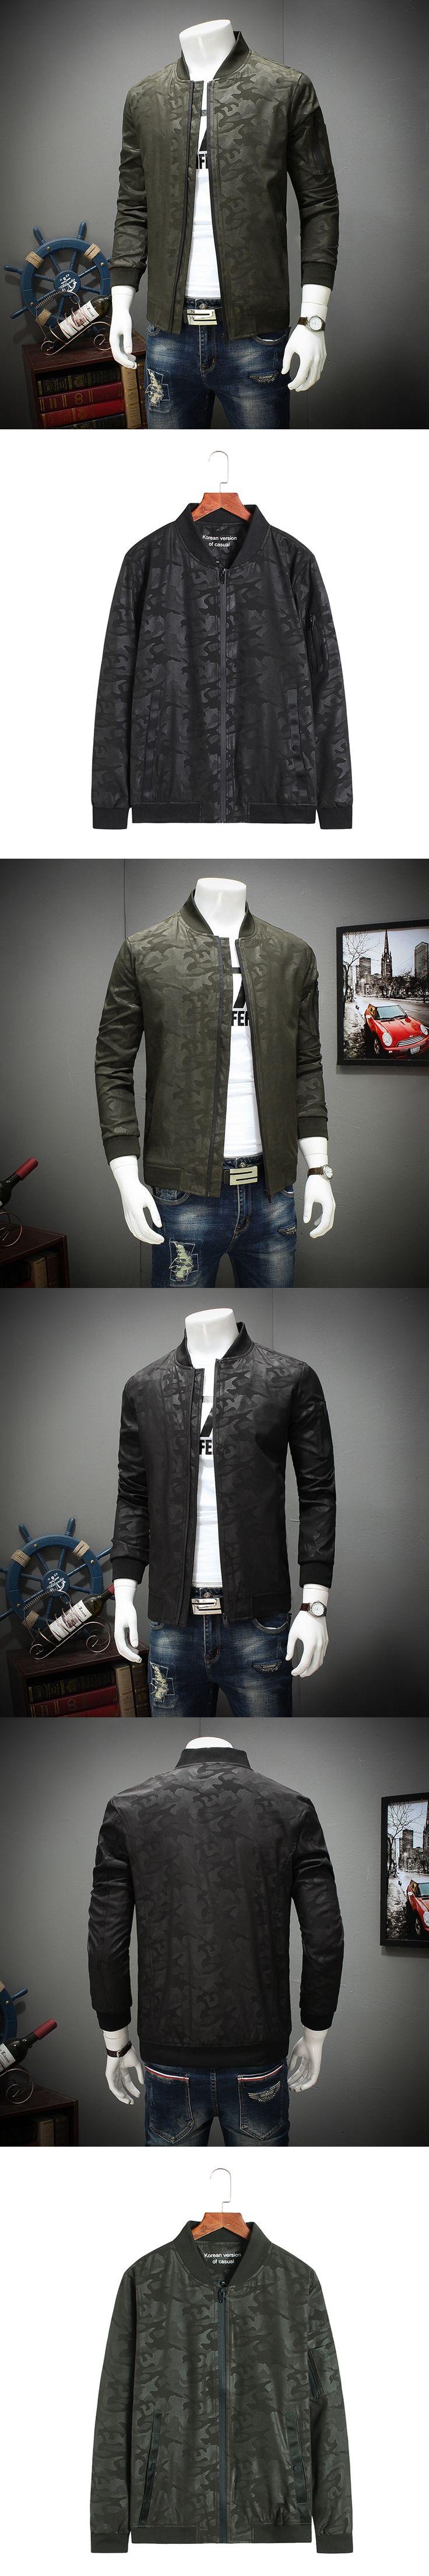 2017 big size 8XL 7XL 6XL 5XL 4XL Men's Waterproof Windpoof Jackets Men Spring Autumn Jacket Coats Male Brand Clothing Plus Size